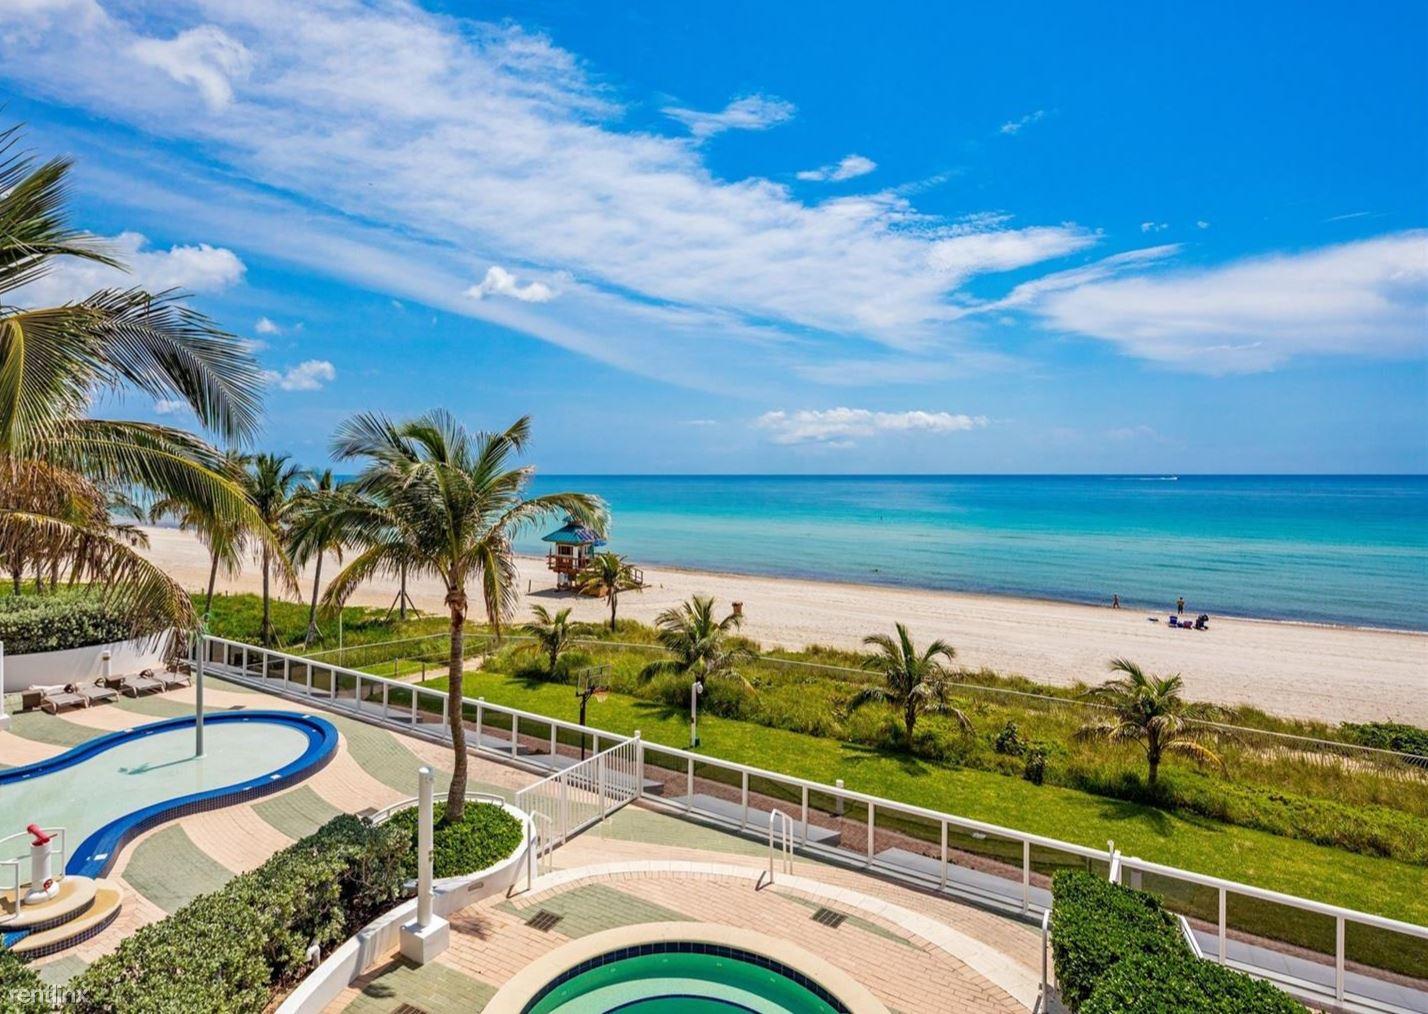 18201 Collins Ave, Sunny Isles Beach, FL - $3,000